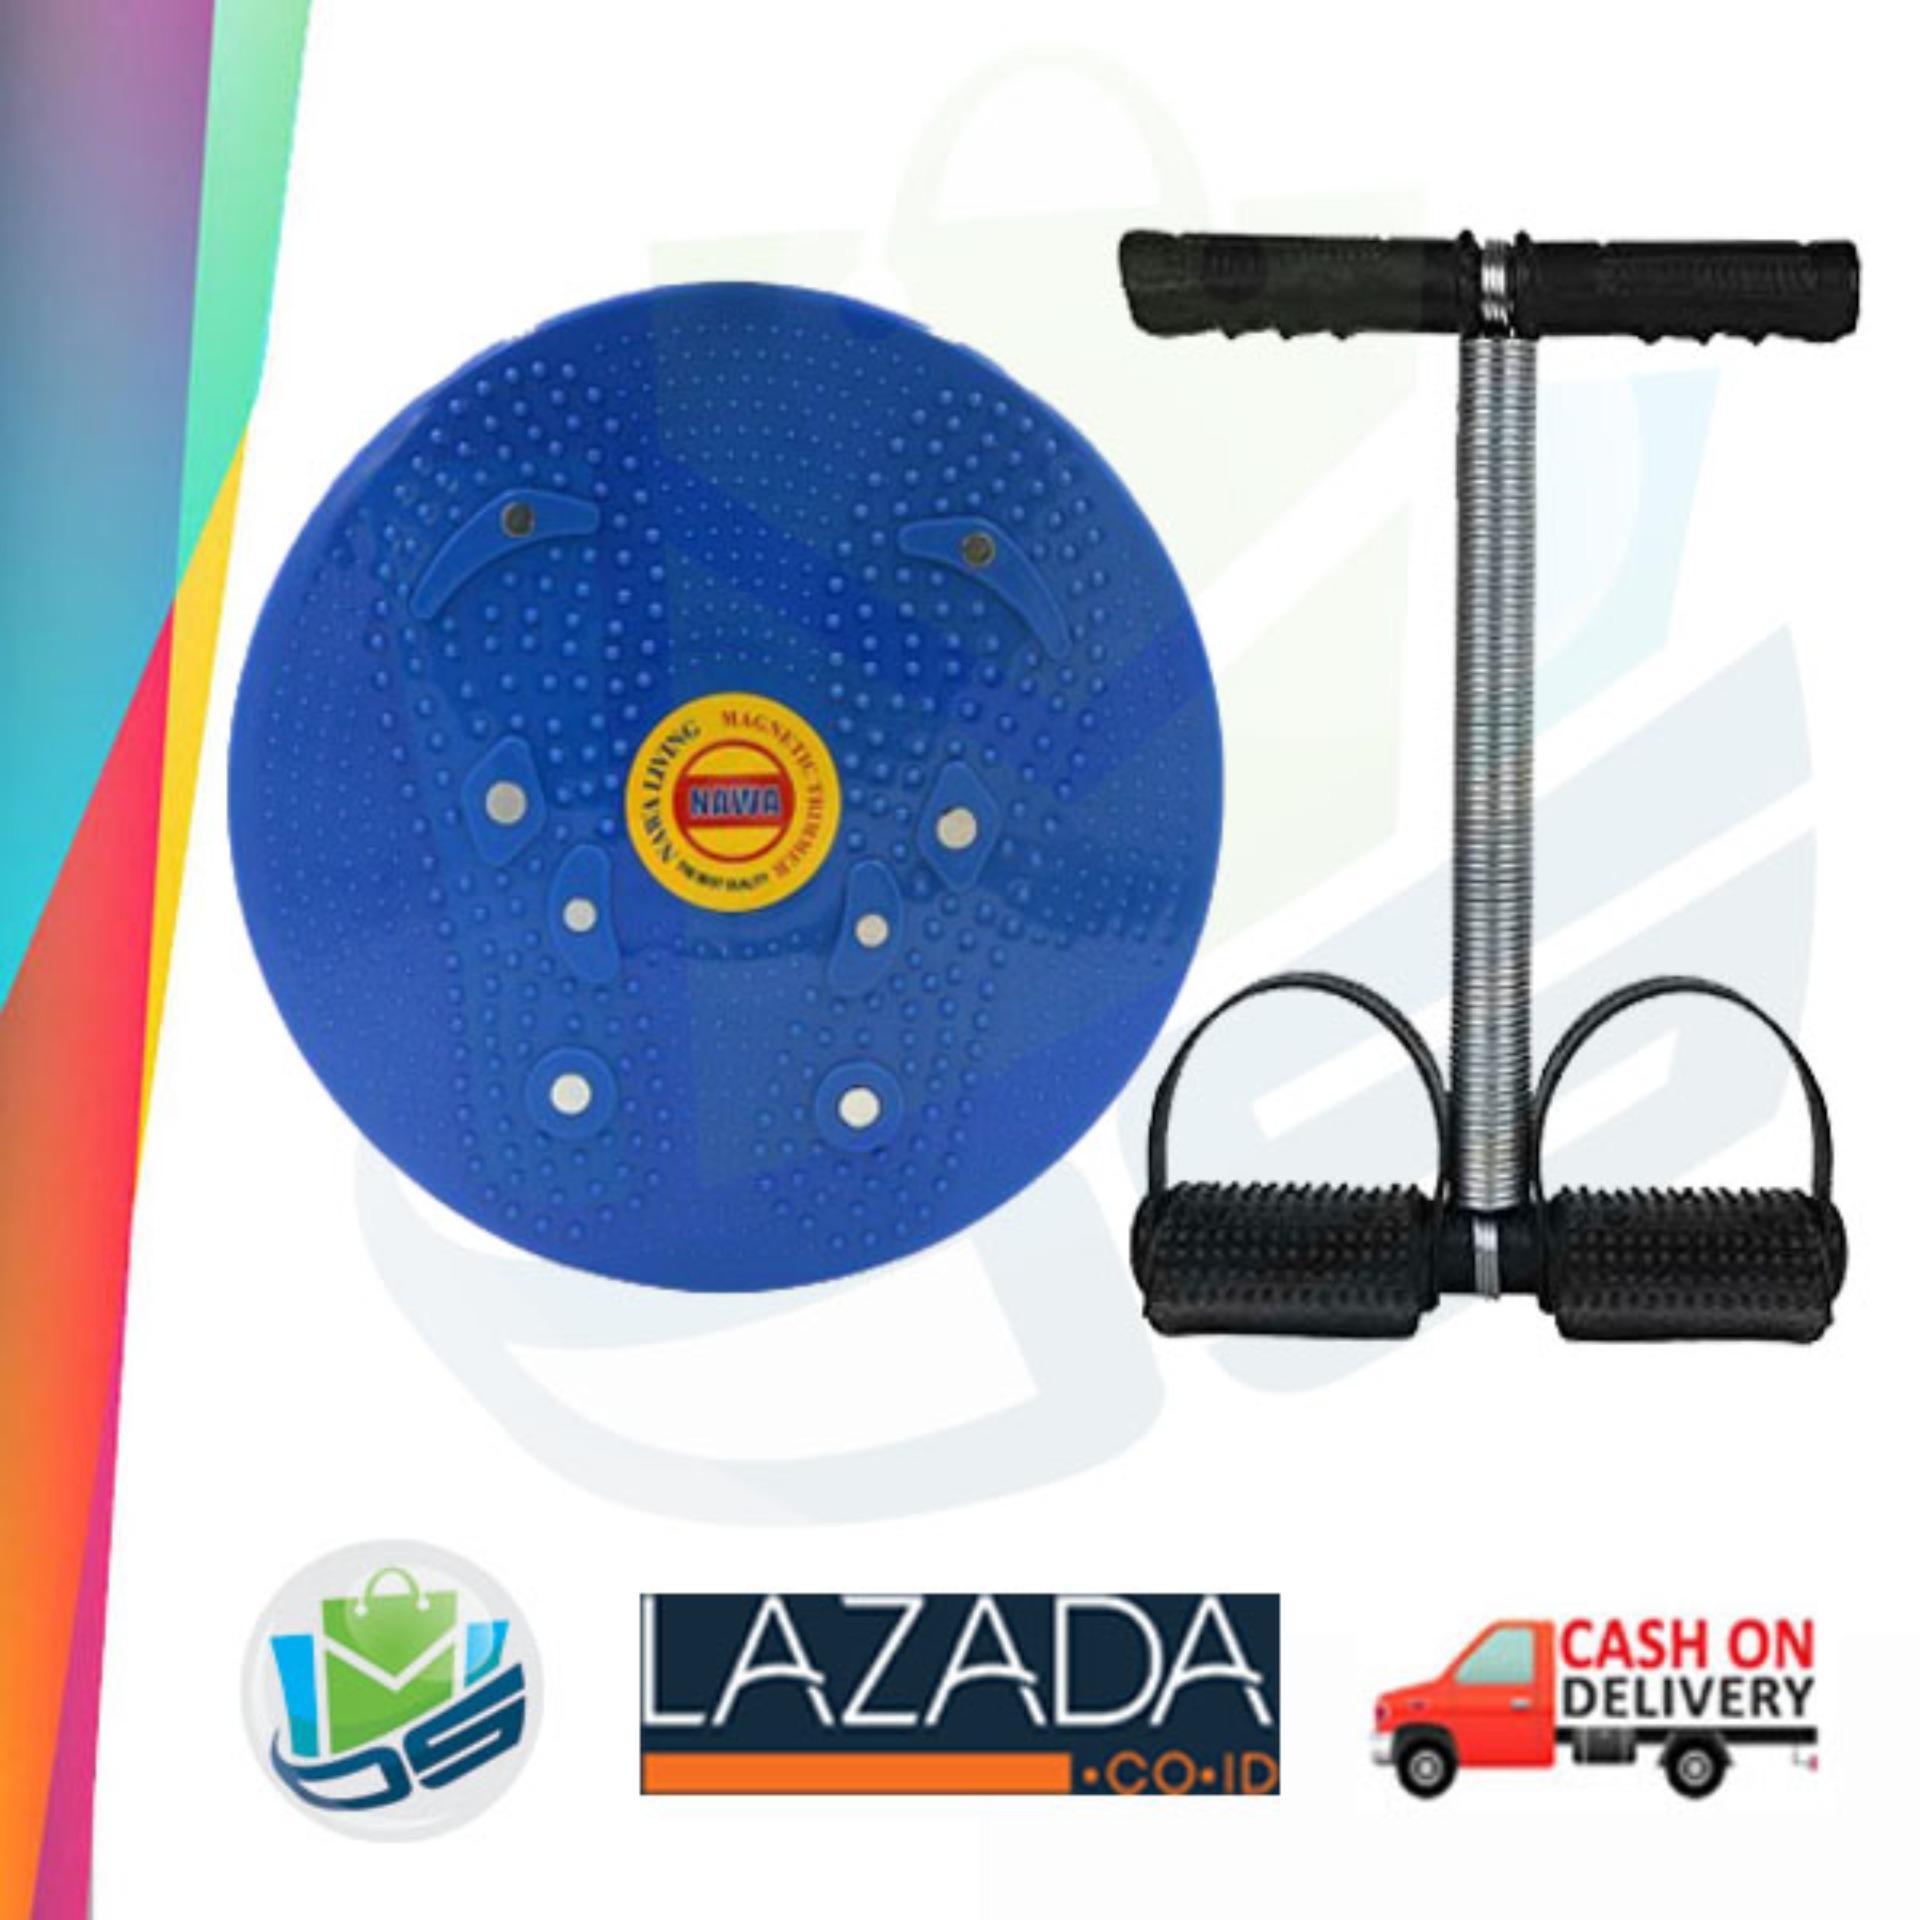 Paket Alat Fitness Pelangsing Tubuh Tummy Trimmer Dan Jogging Body Plate | Lazada Indonesia